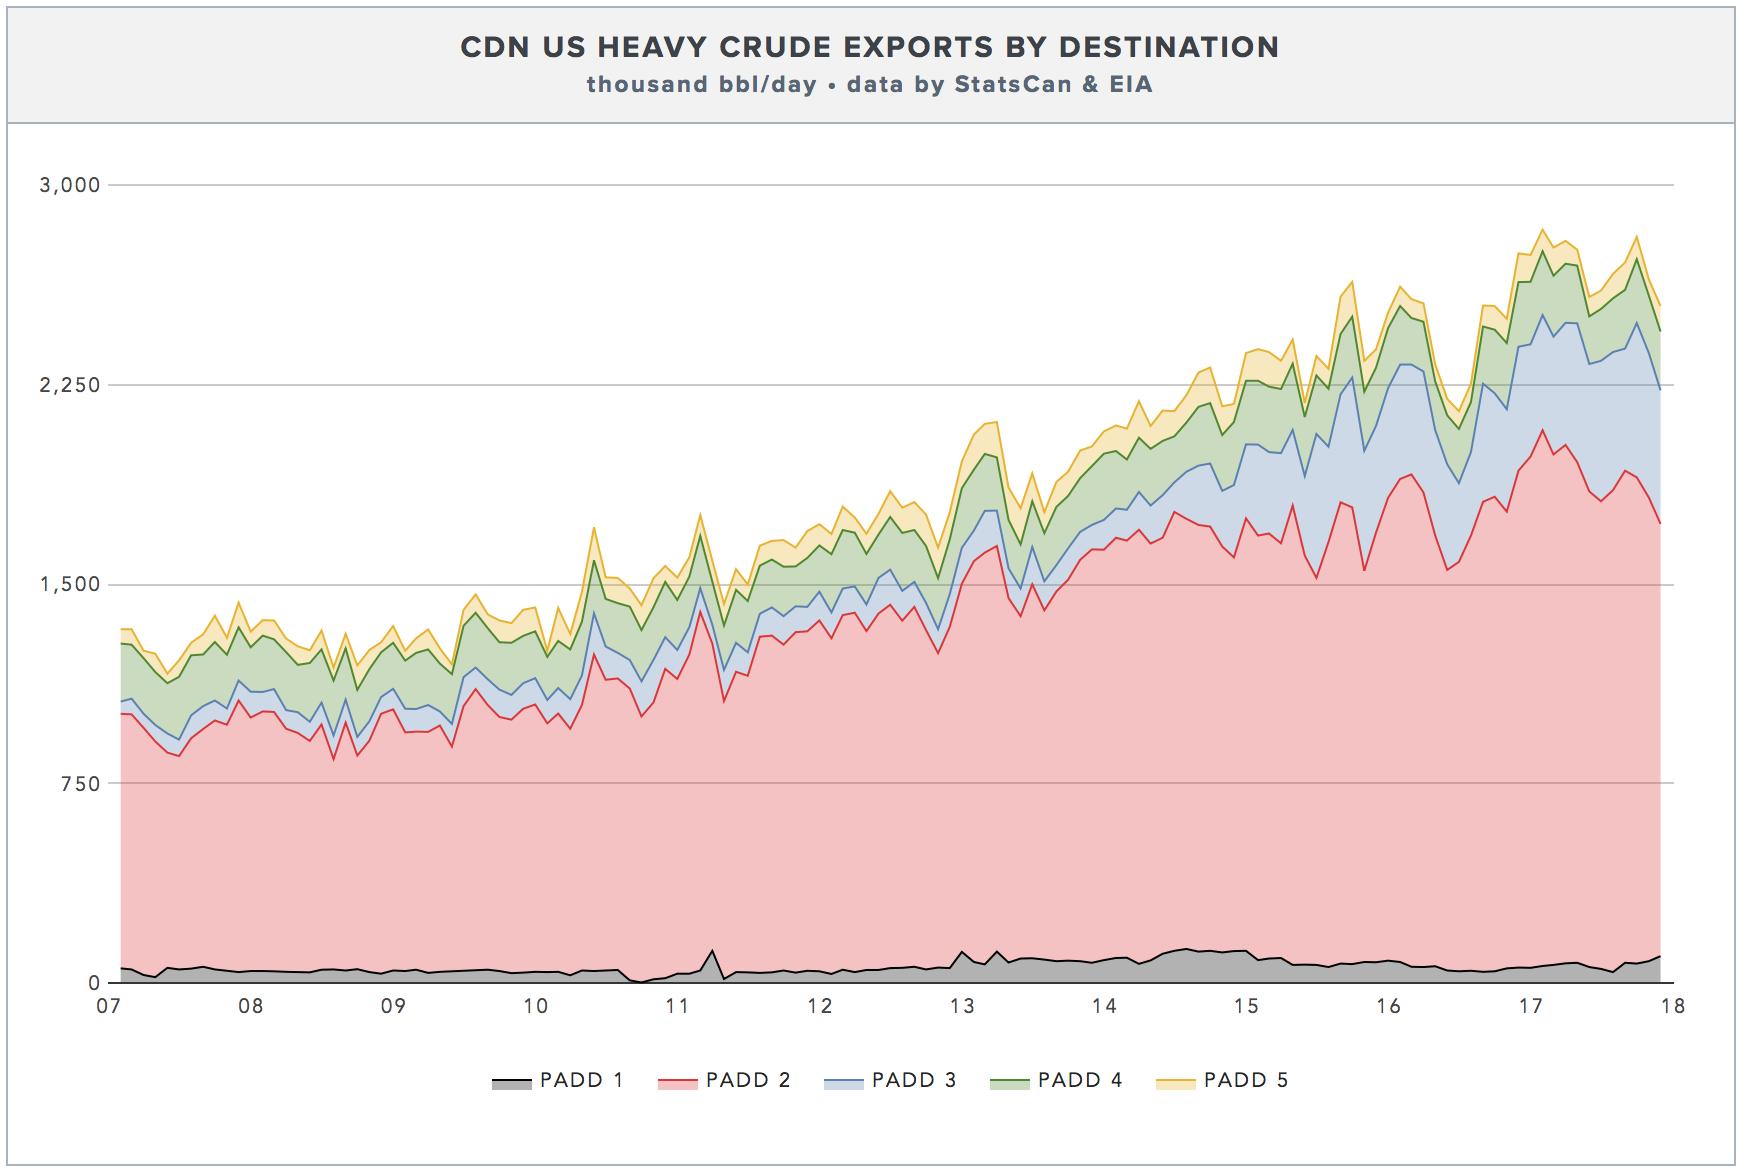 CDN-HEAVY-OIL-EXPORTS-REGION-PADD.png